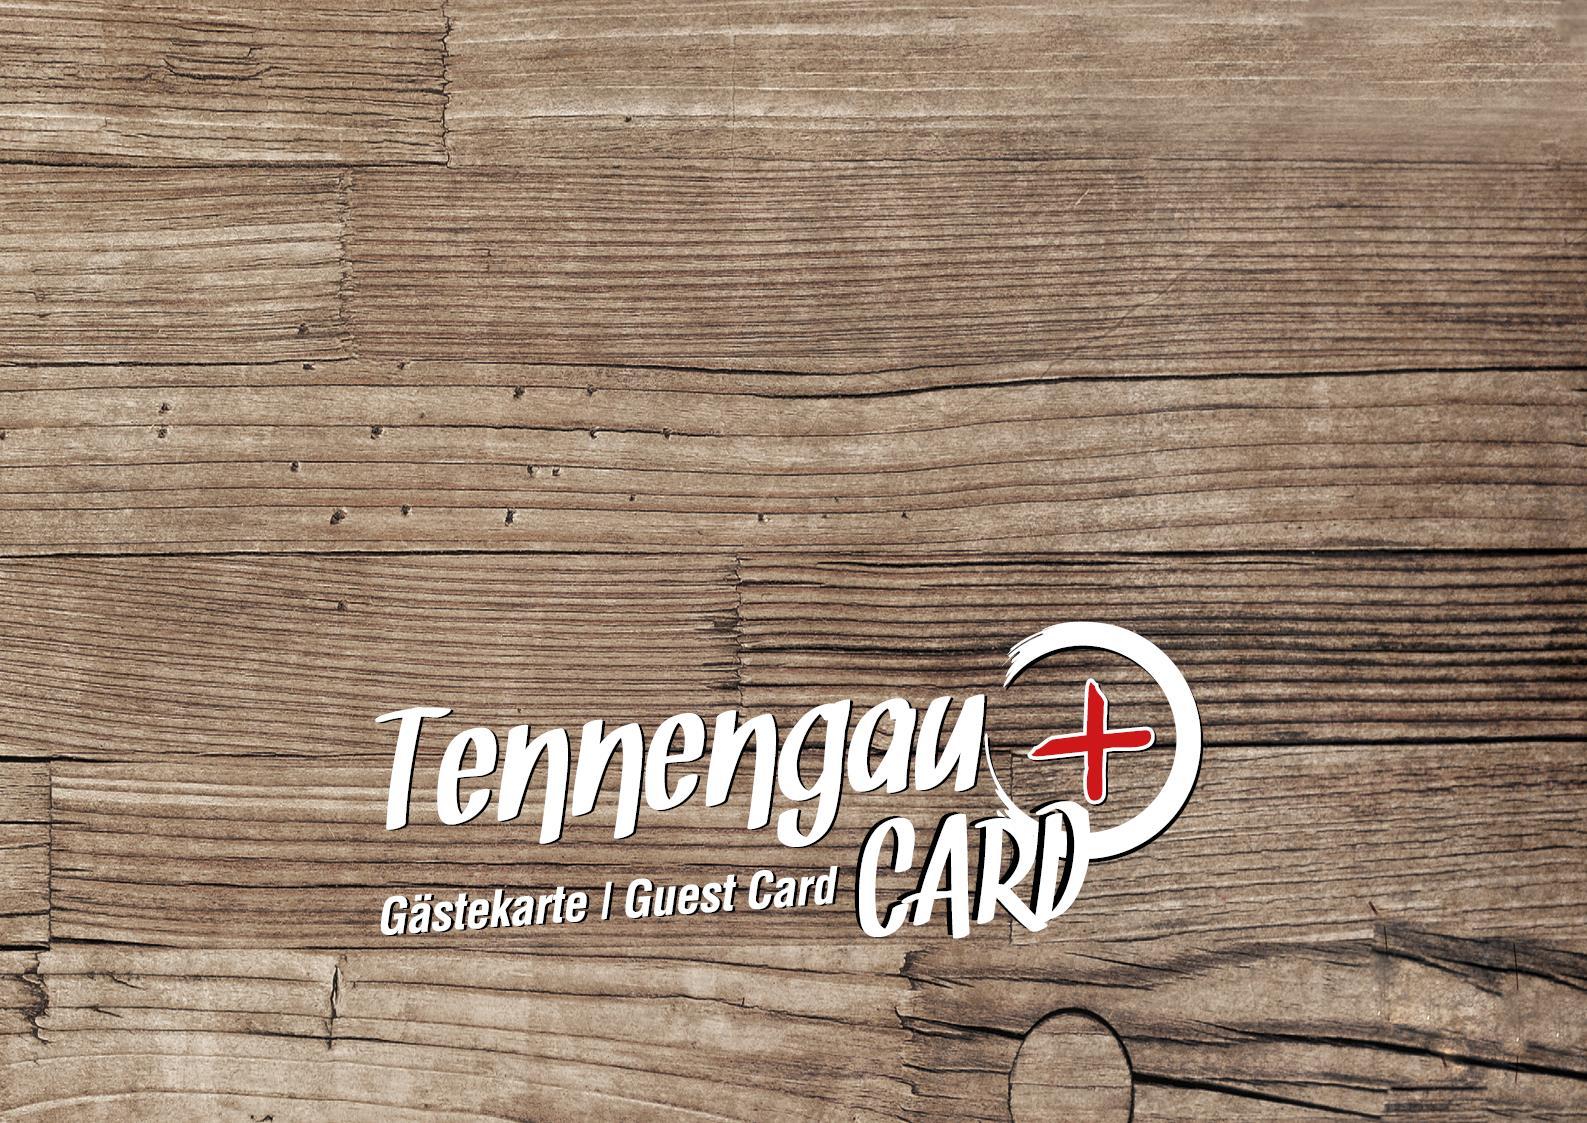 TennengauPLUS Card | ©Tennengau.com